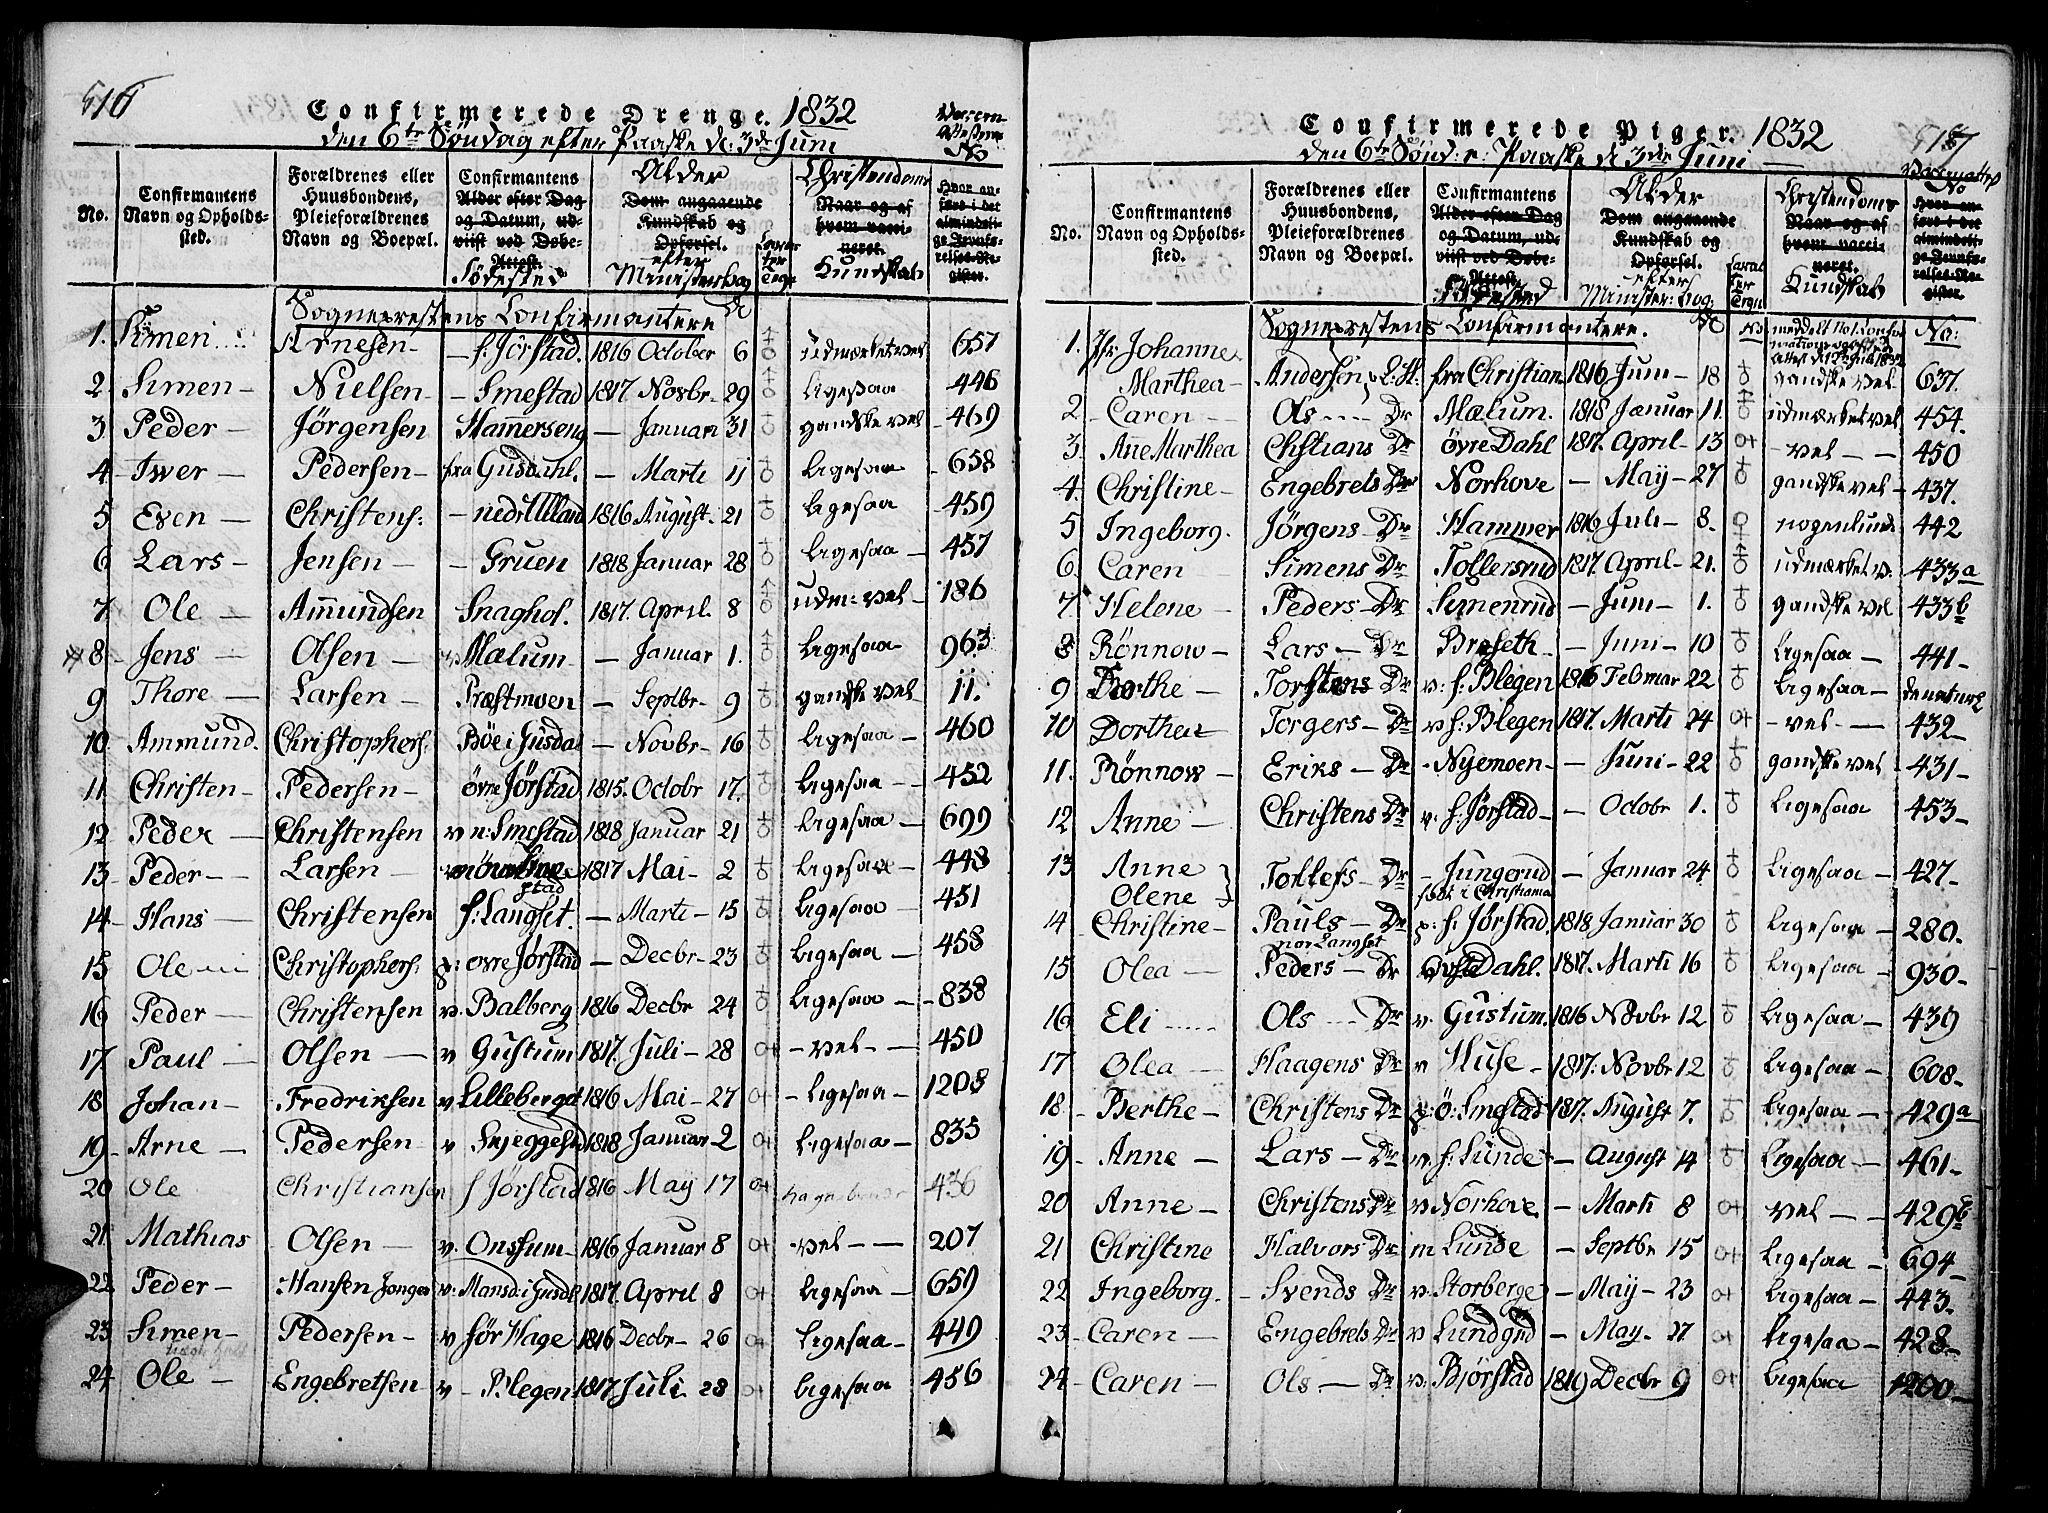 SAH, Fåberg prestekontor, Ministerialbok nr. 3, 1818-1833, s. 516-517